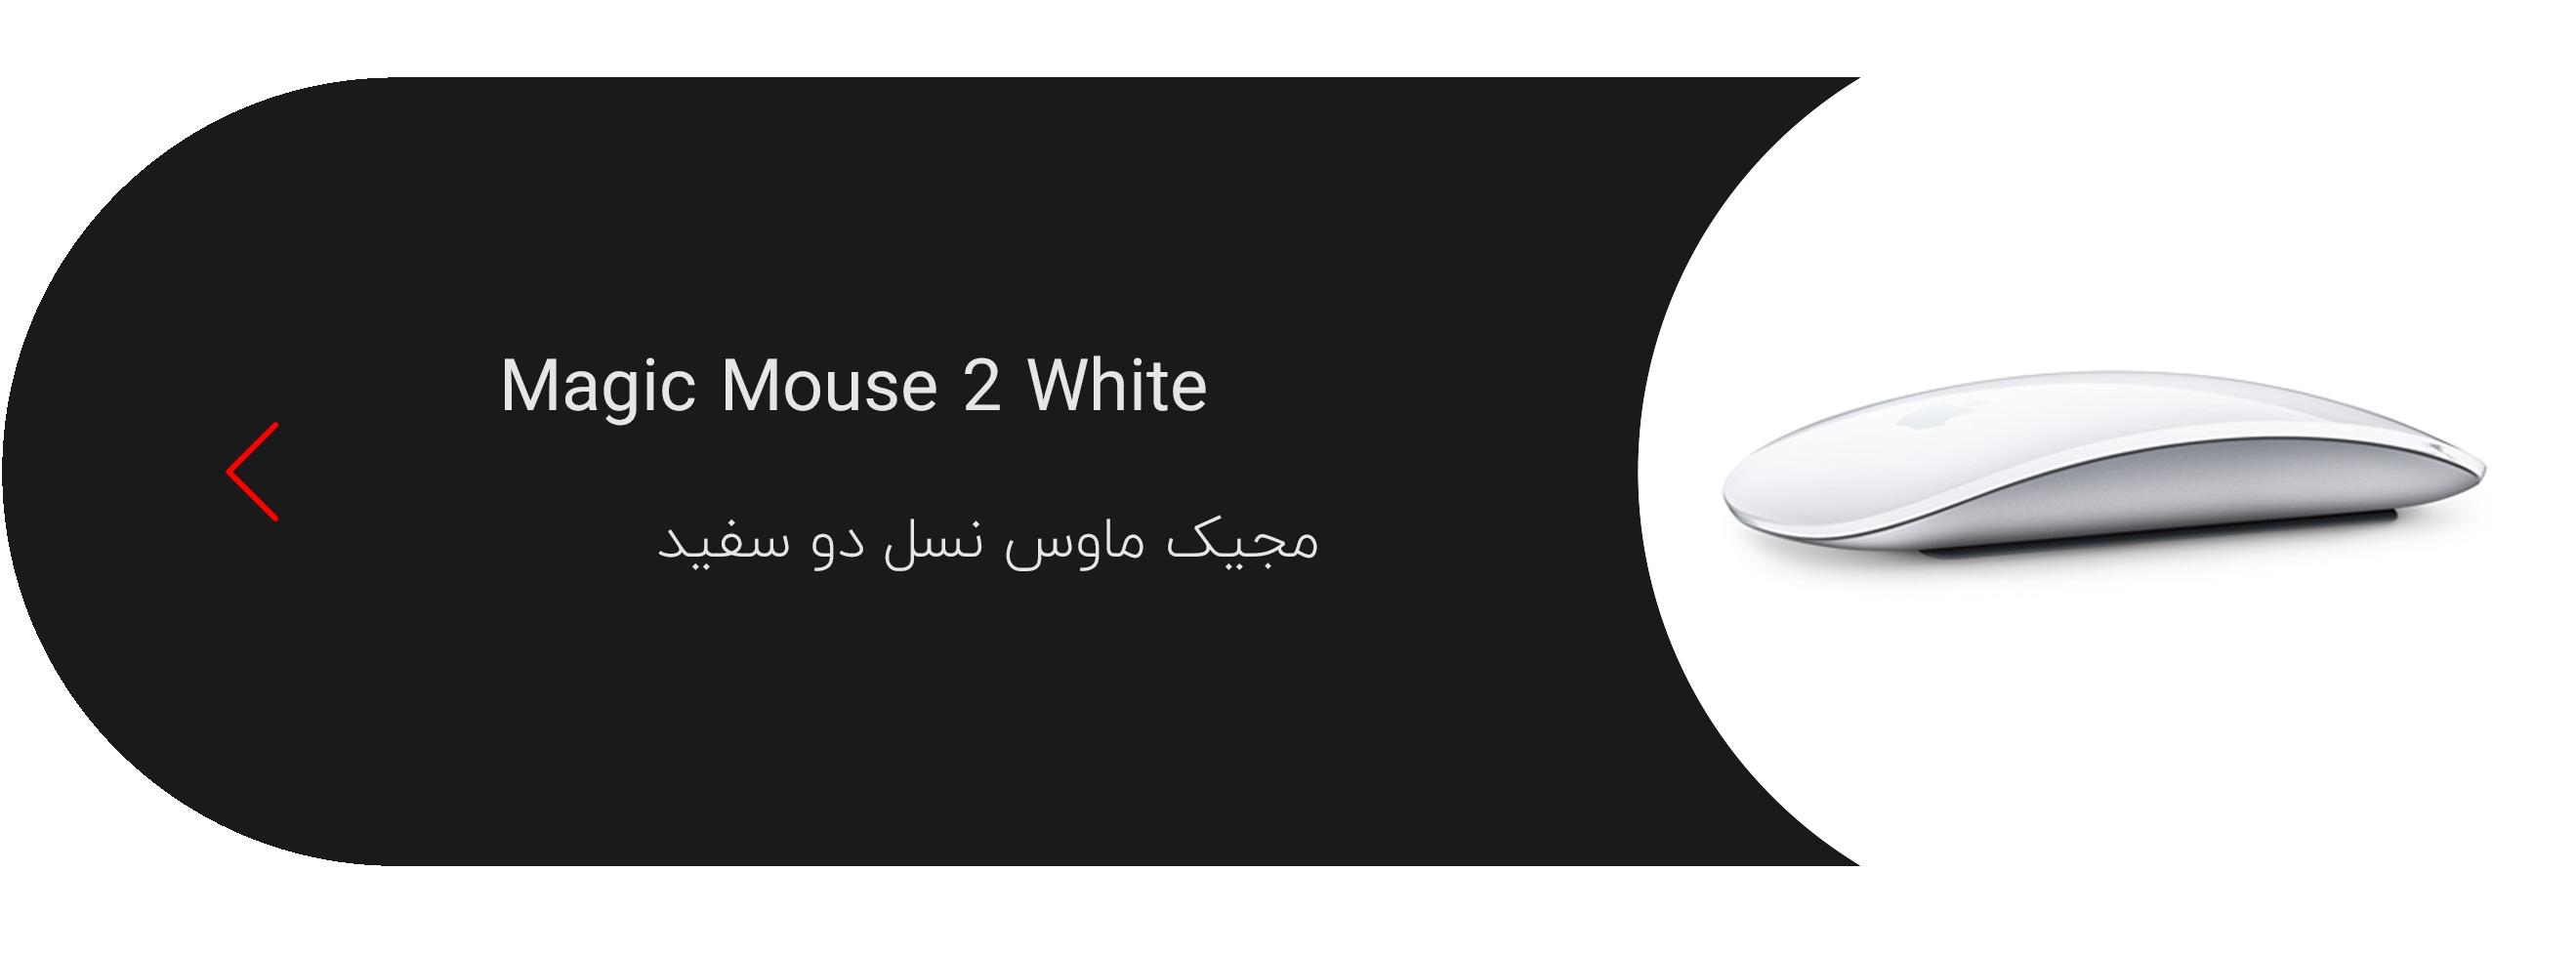 مجیک ماوس ۲ سفید